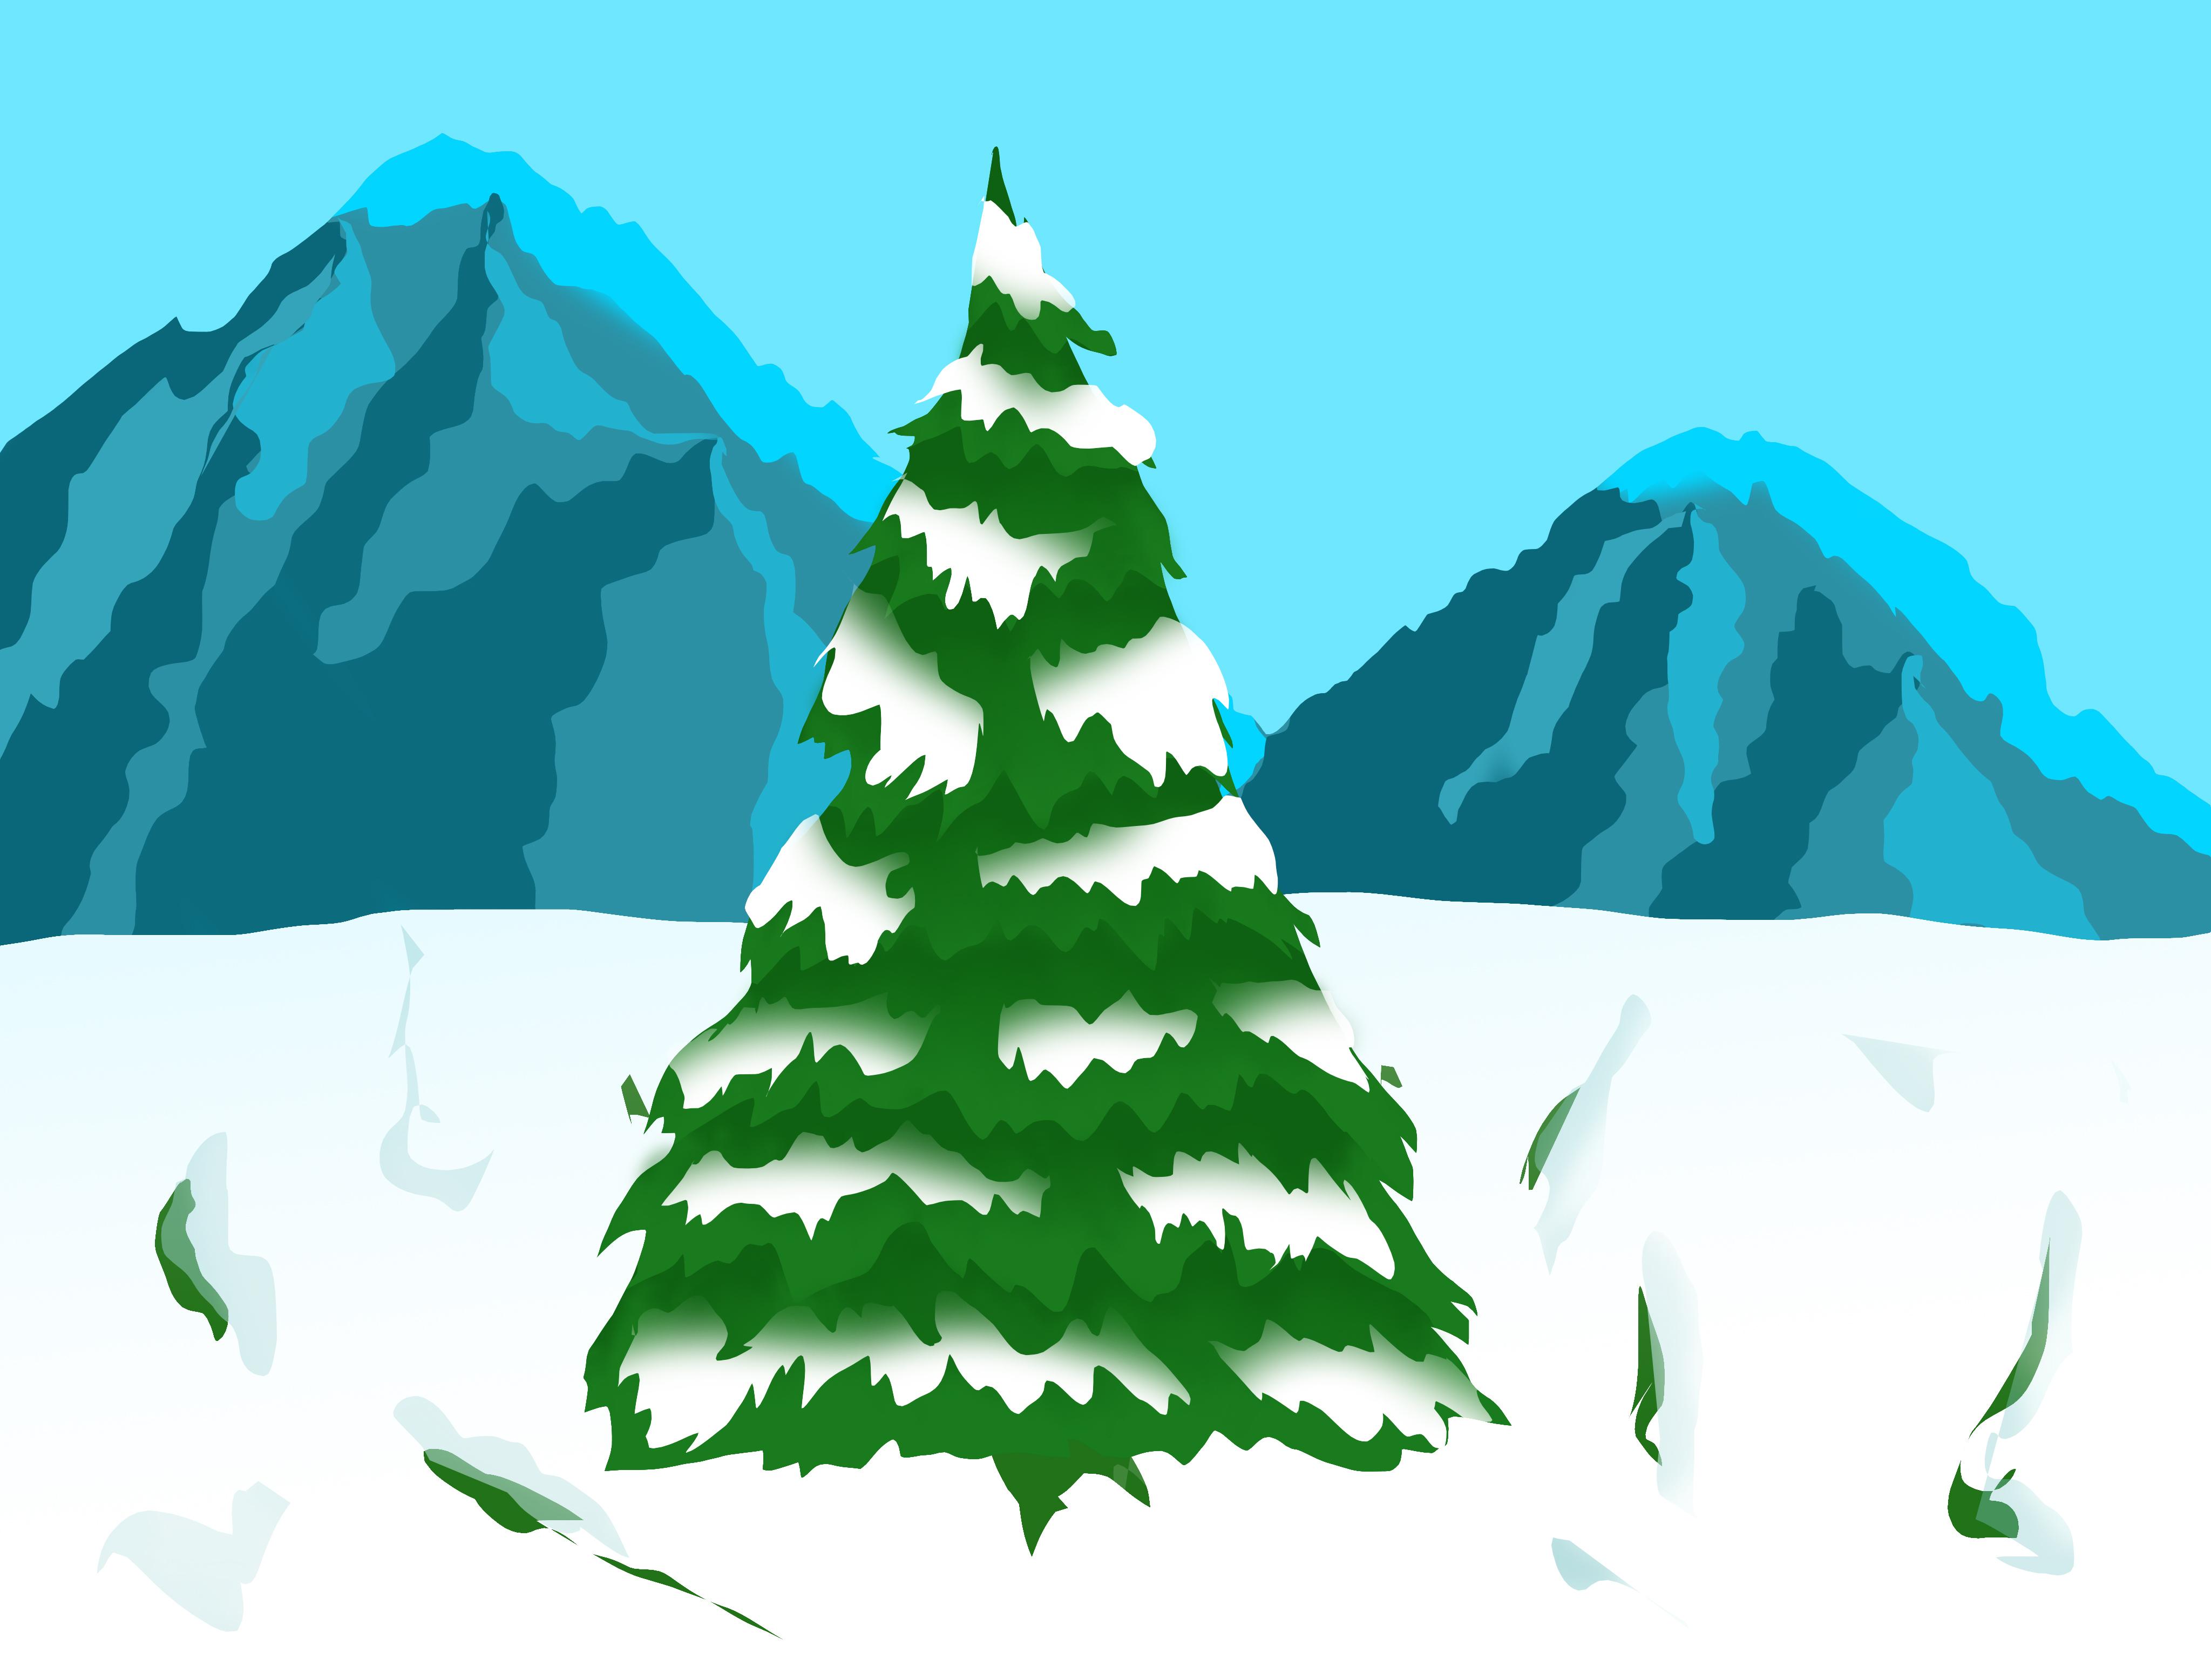 Southpark Styled Christmas Tree